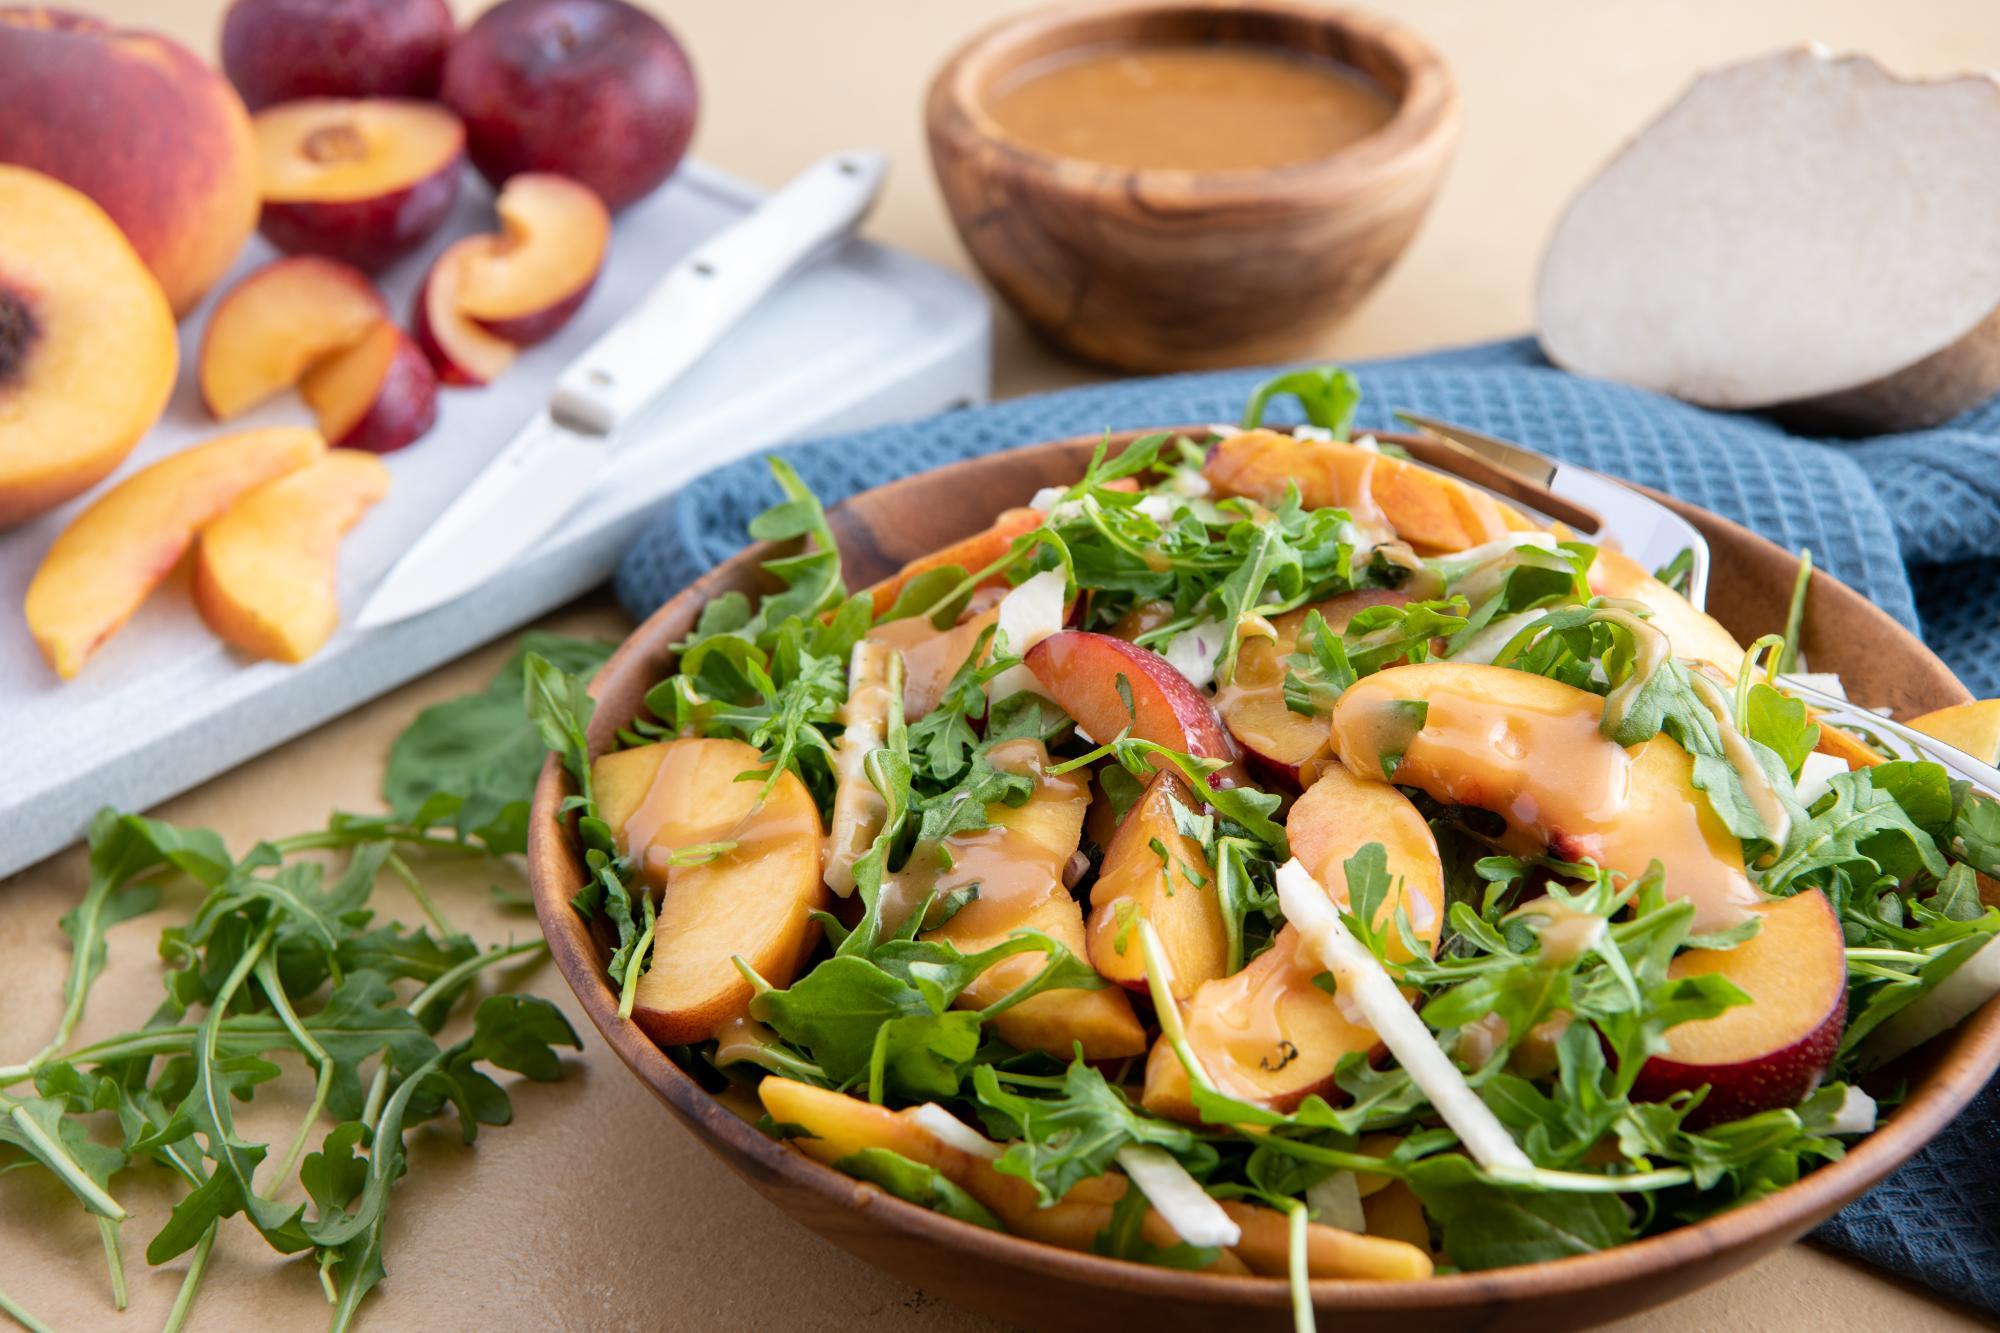 Plum, Peach and Jicama Salad with Plum Vinaigrette